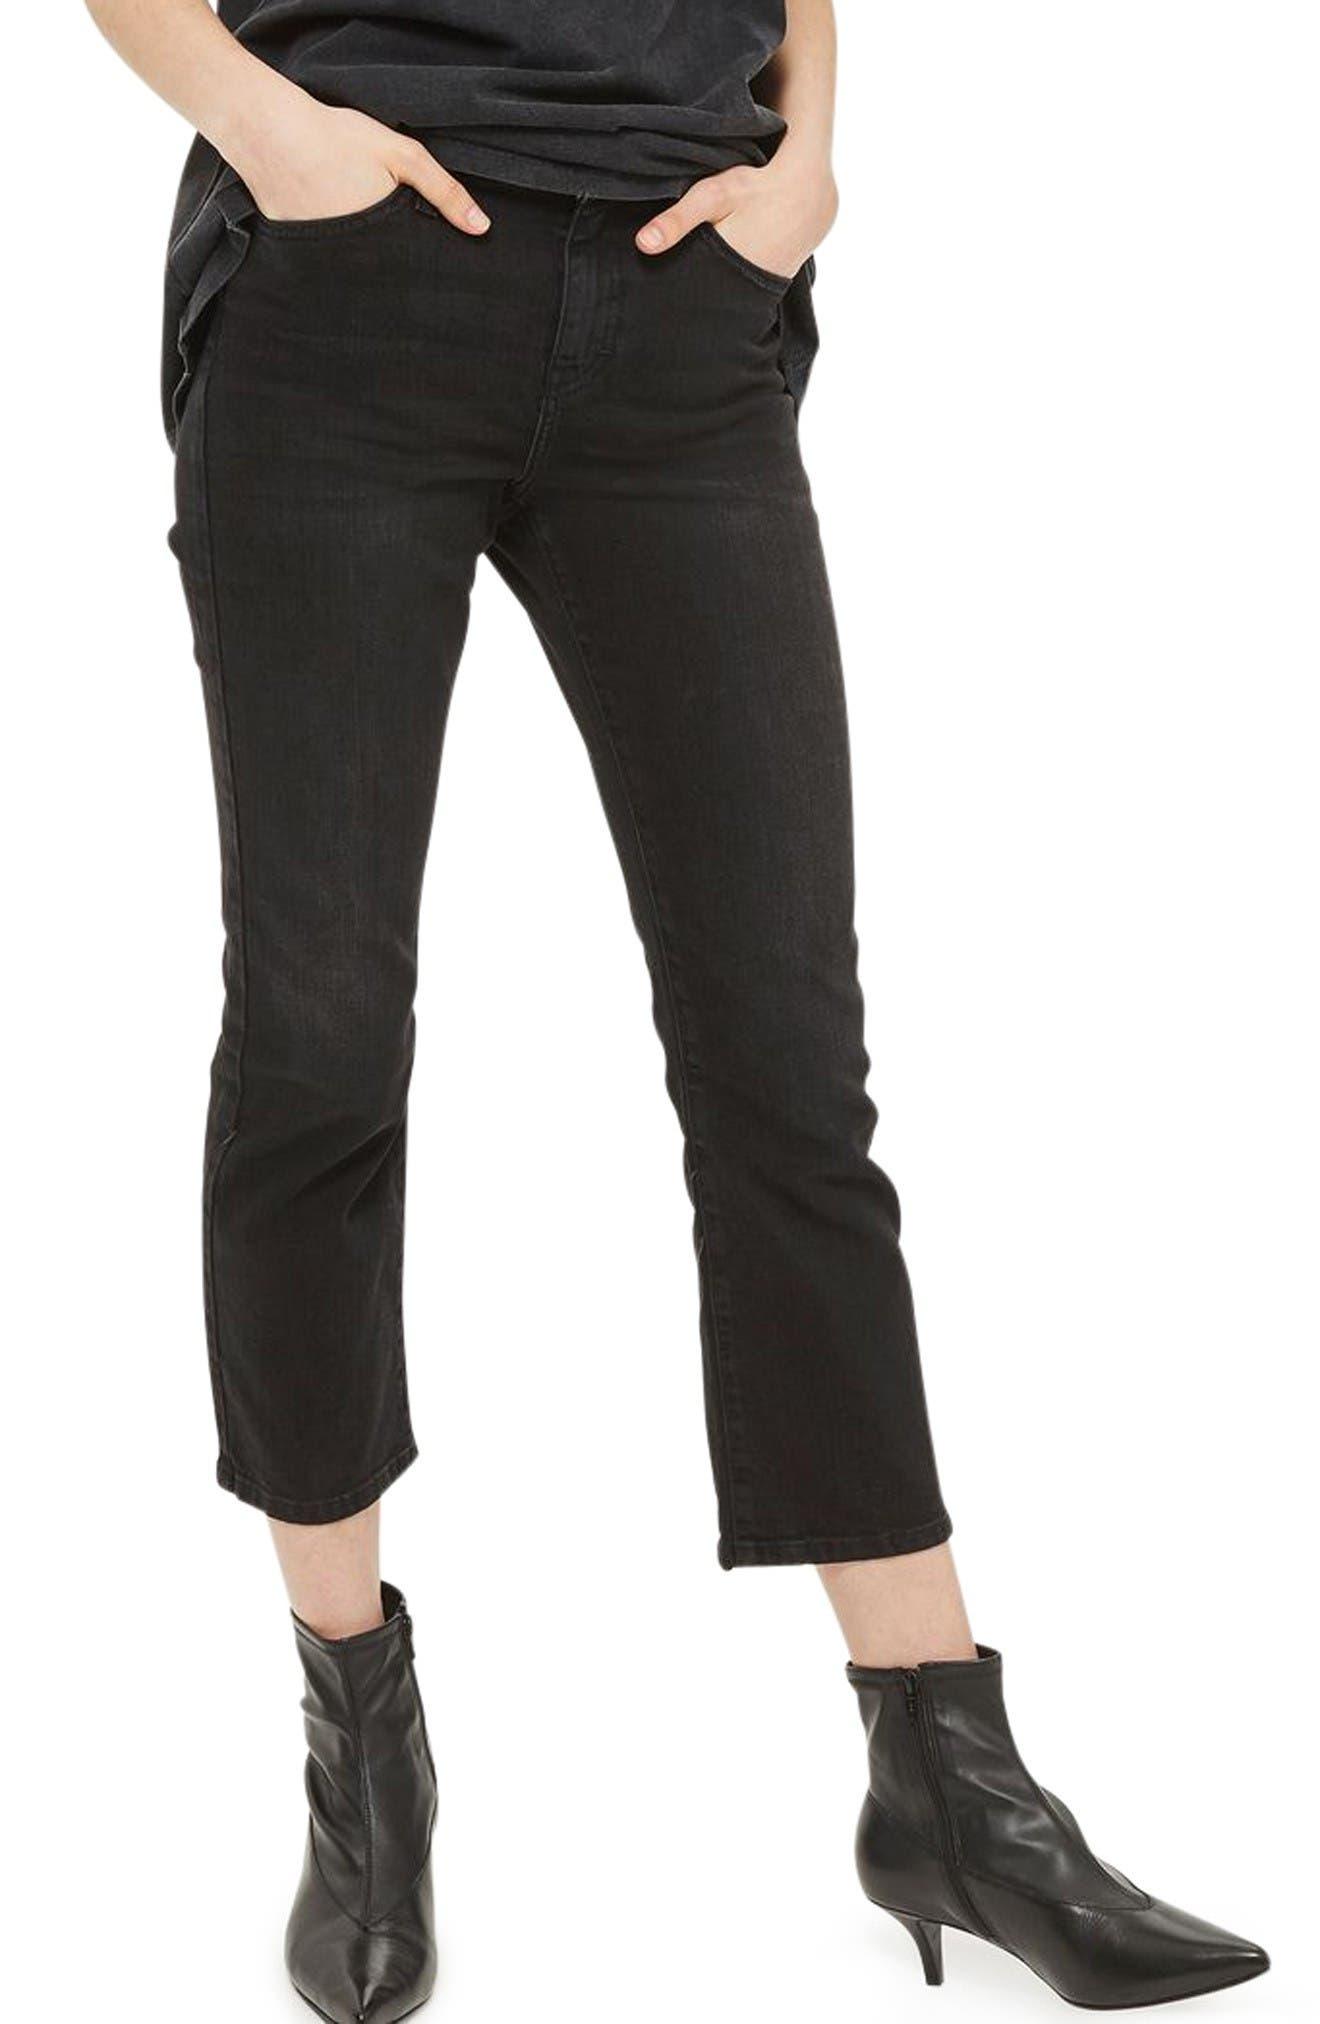 Topshop Dree Kick Flare Jeans